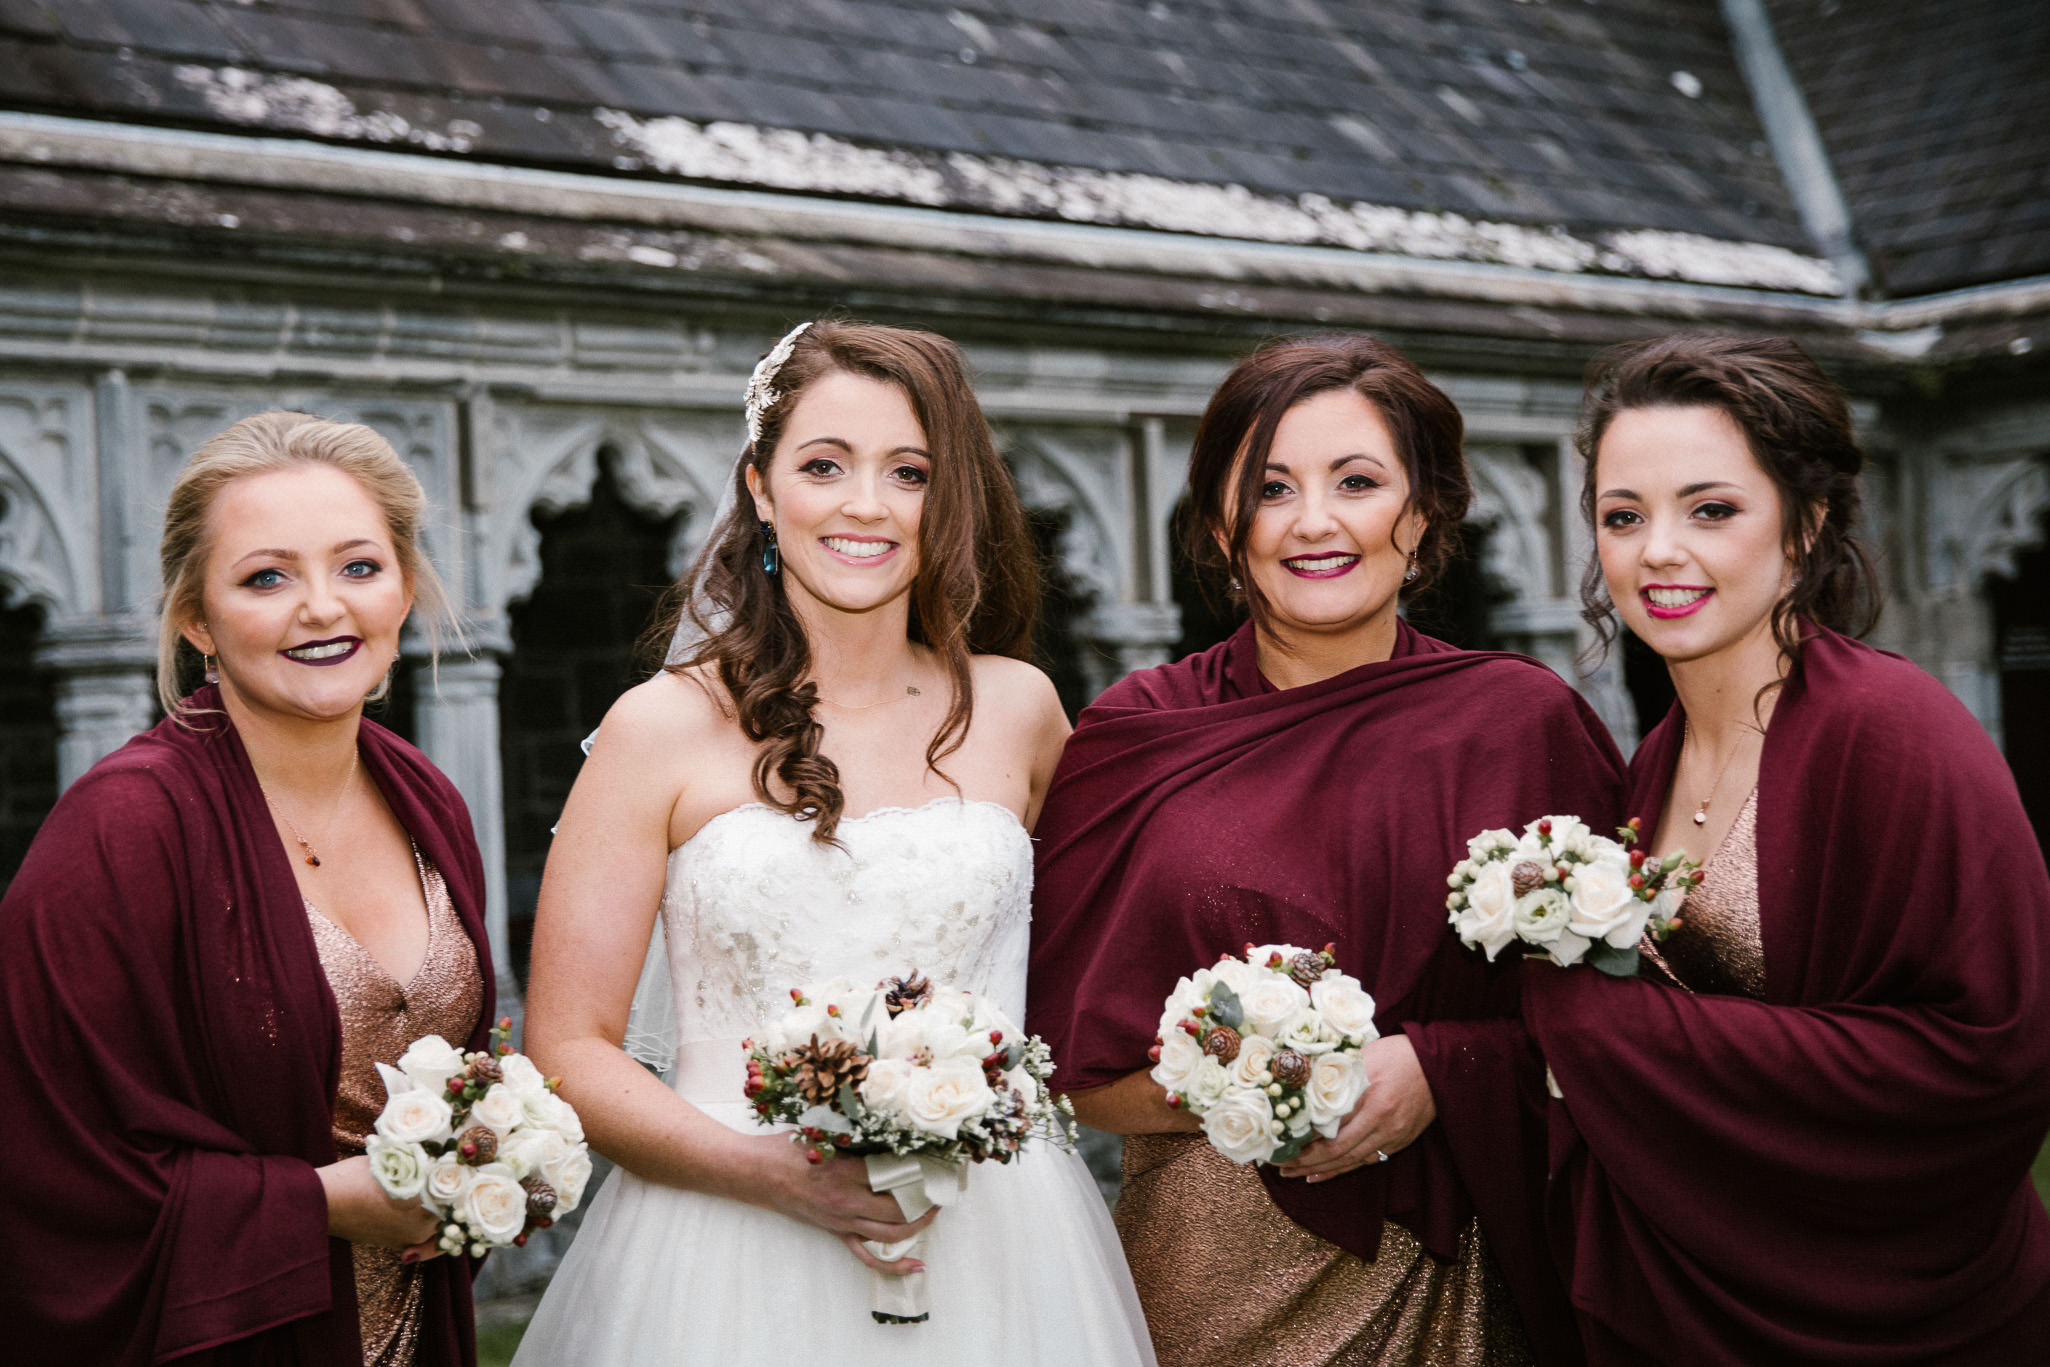 clairebyrnephotography-wedding-night-sparklers-new-years-eve-denyce-leonard-10.jpg